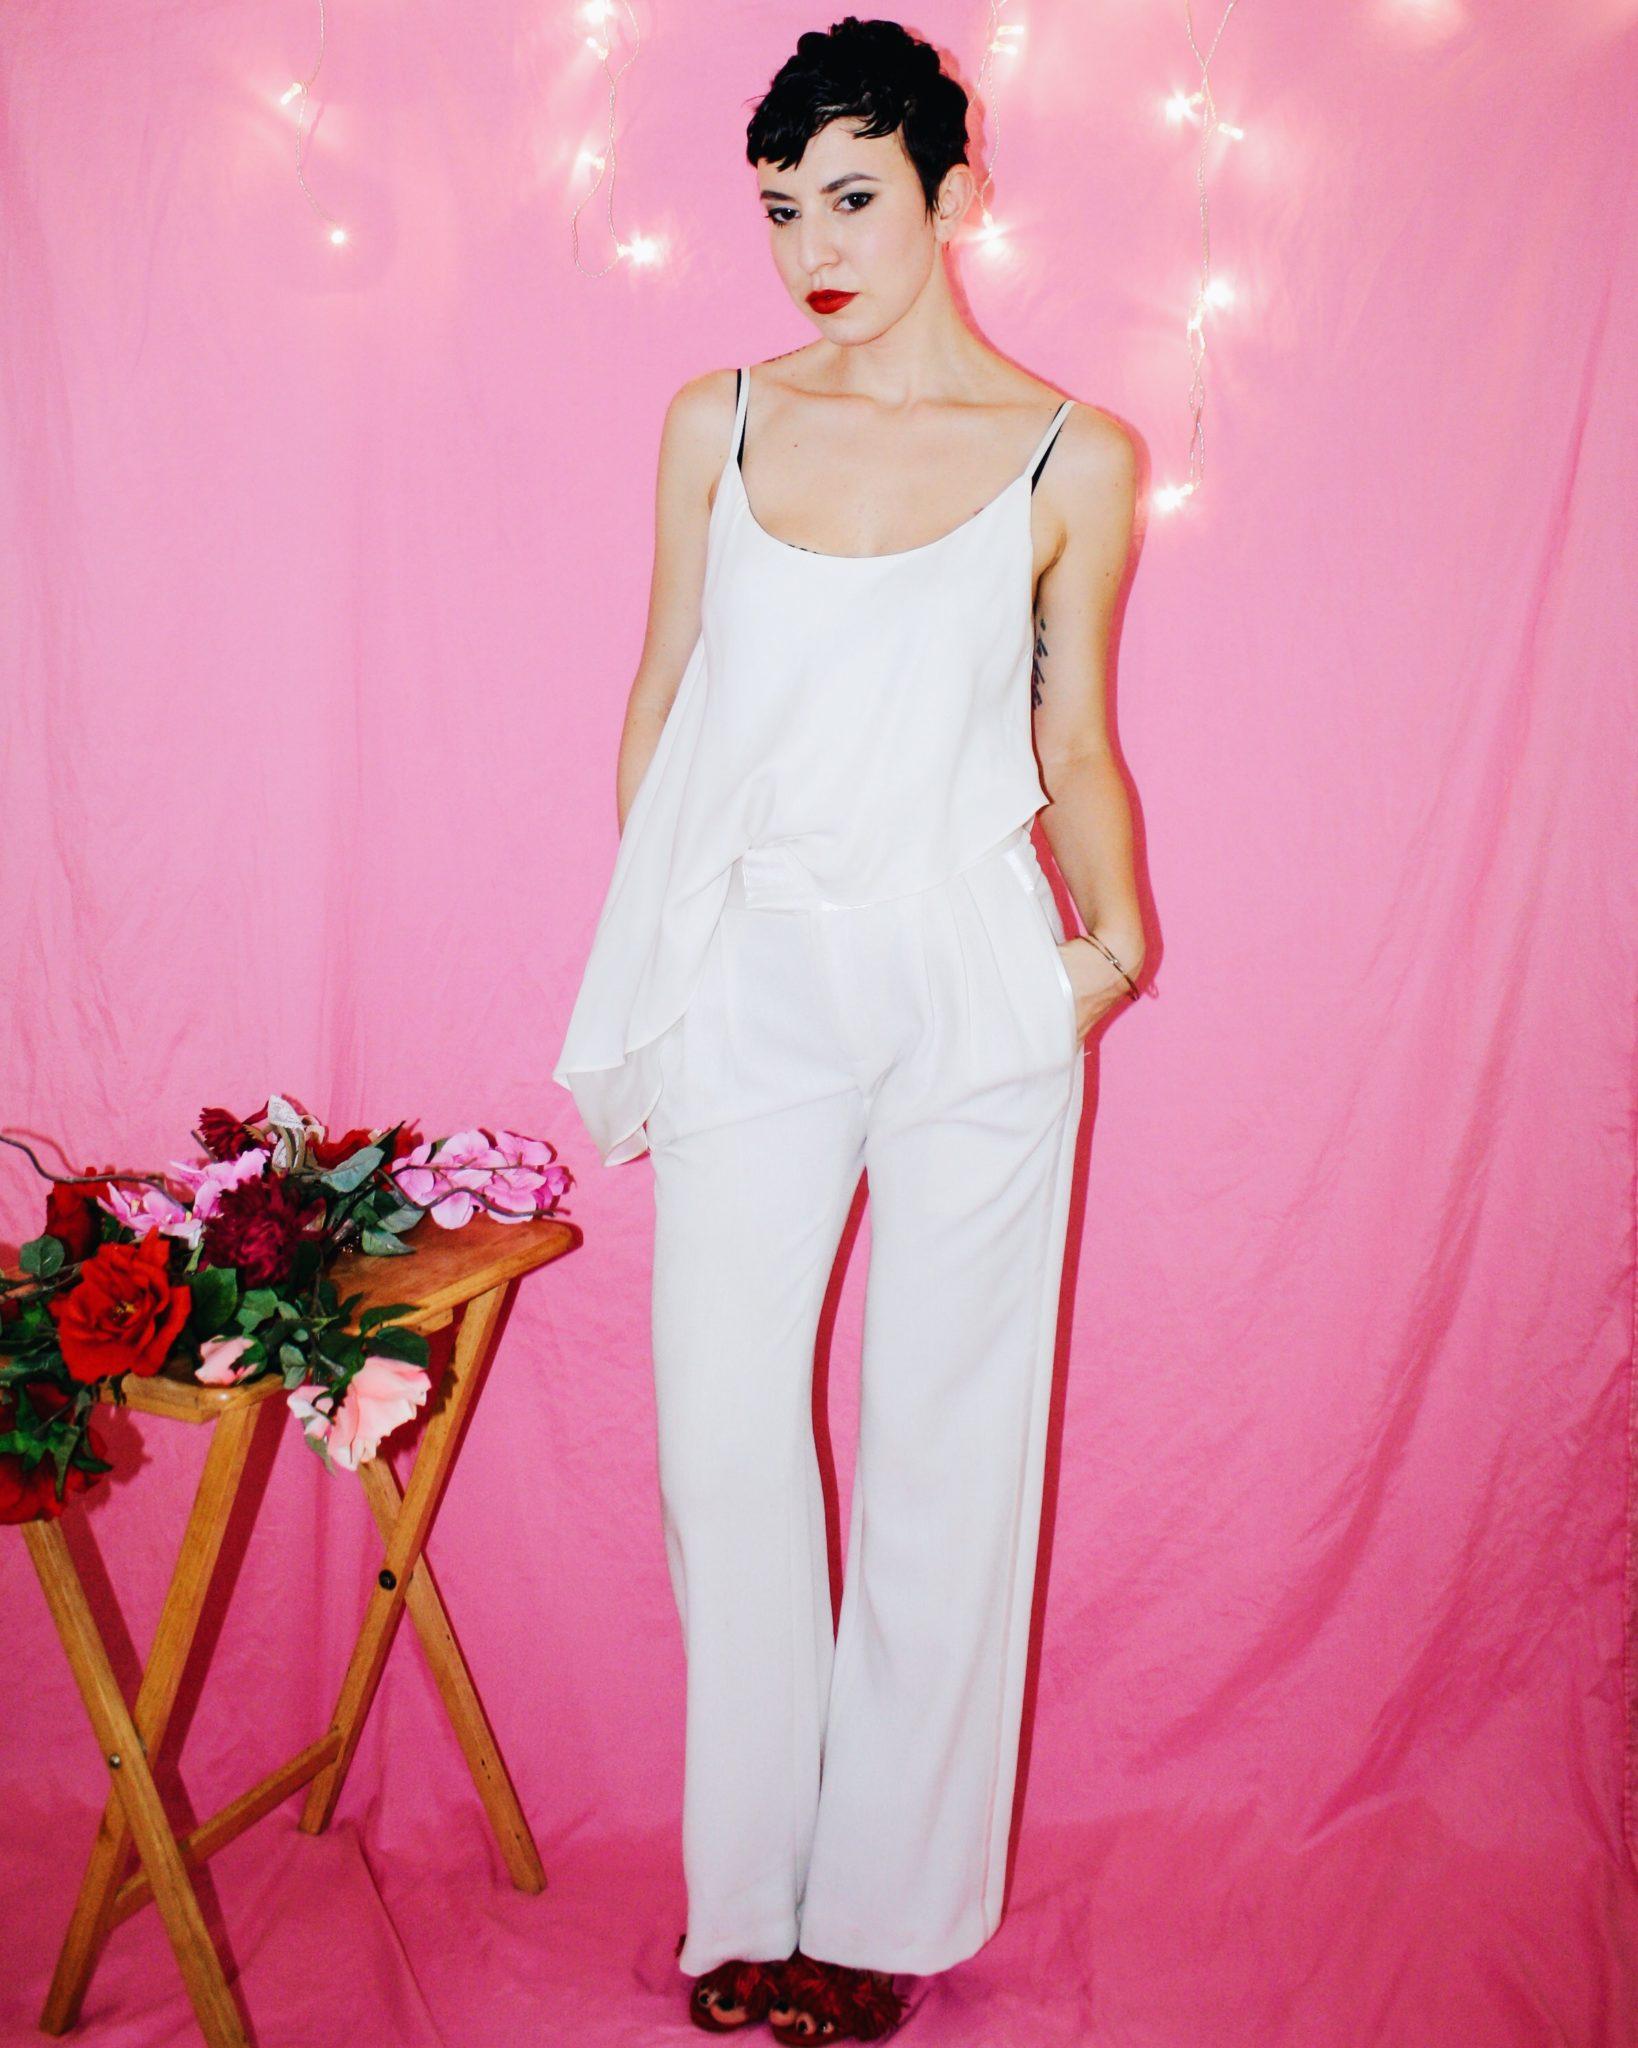 proenza schouler designer imitation white ruffle top spring summer 2018 2017 flowers pink 2